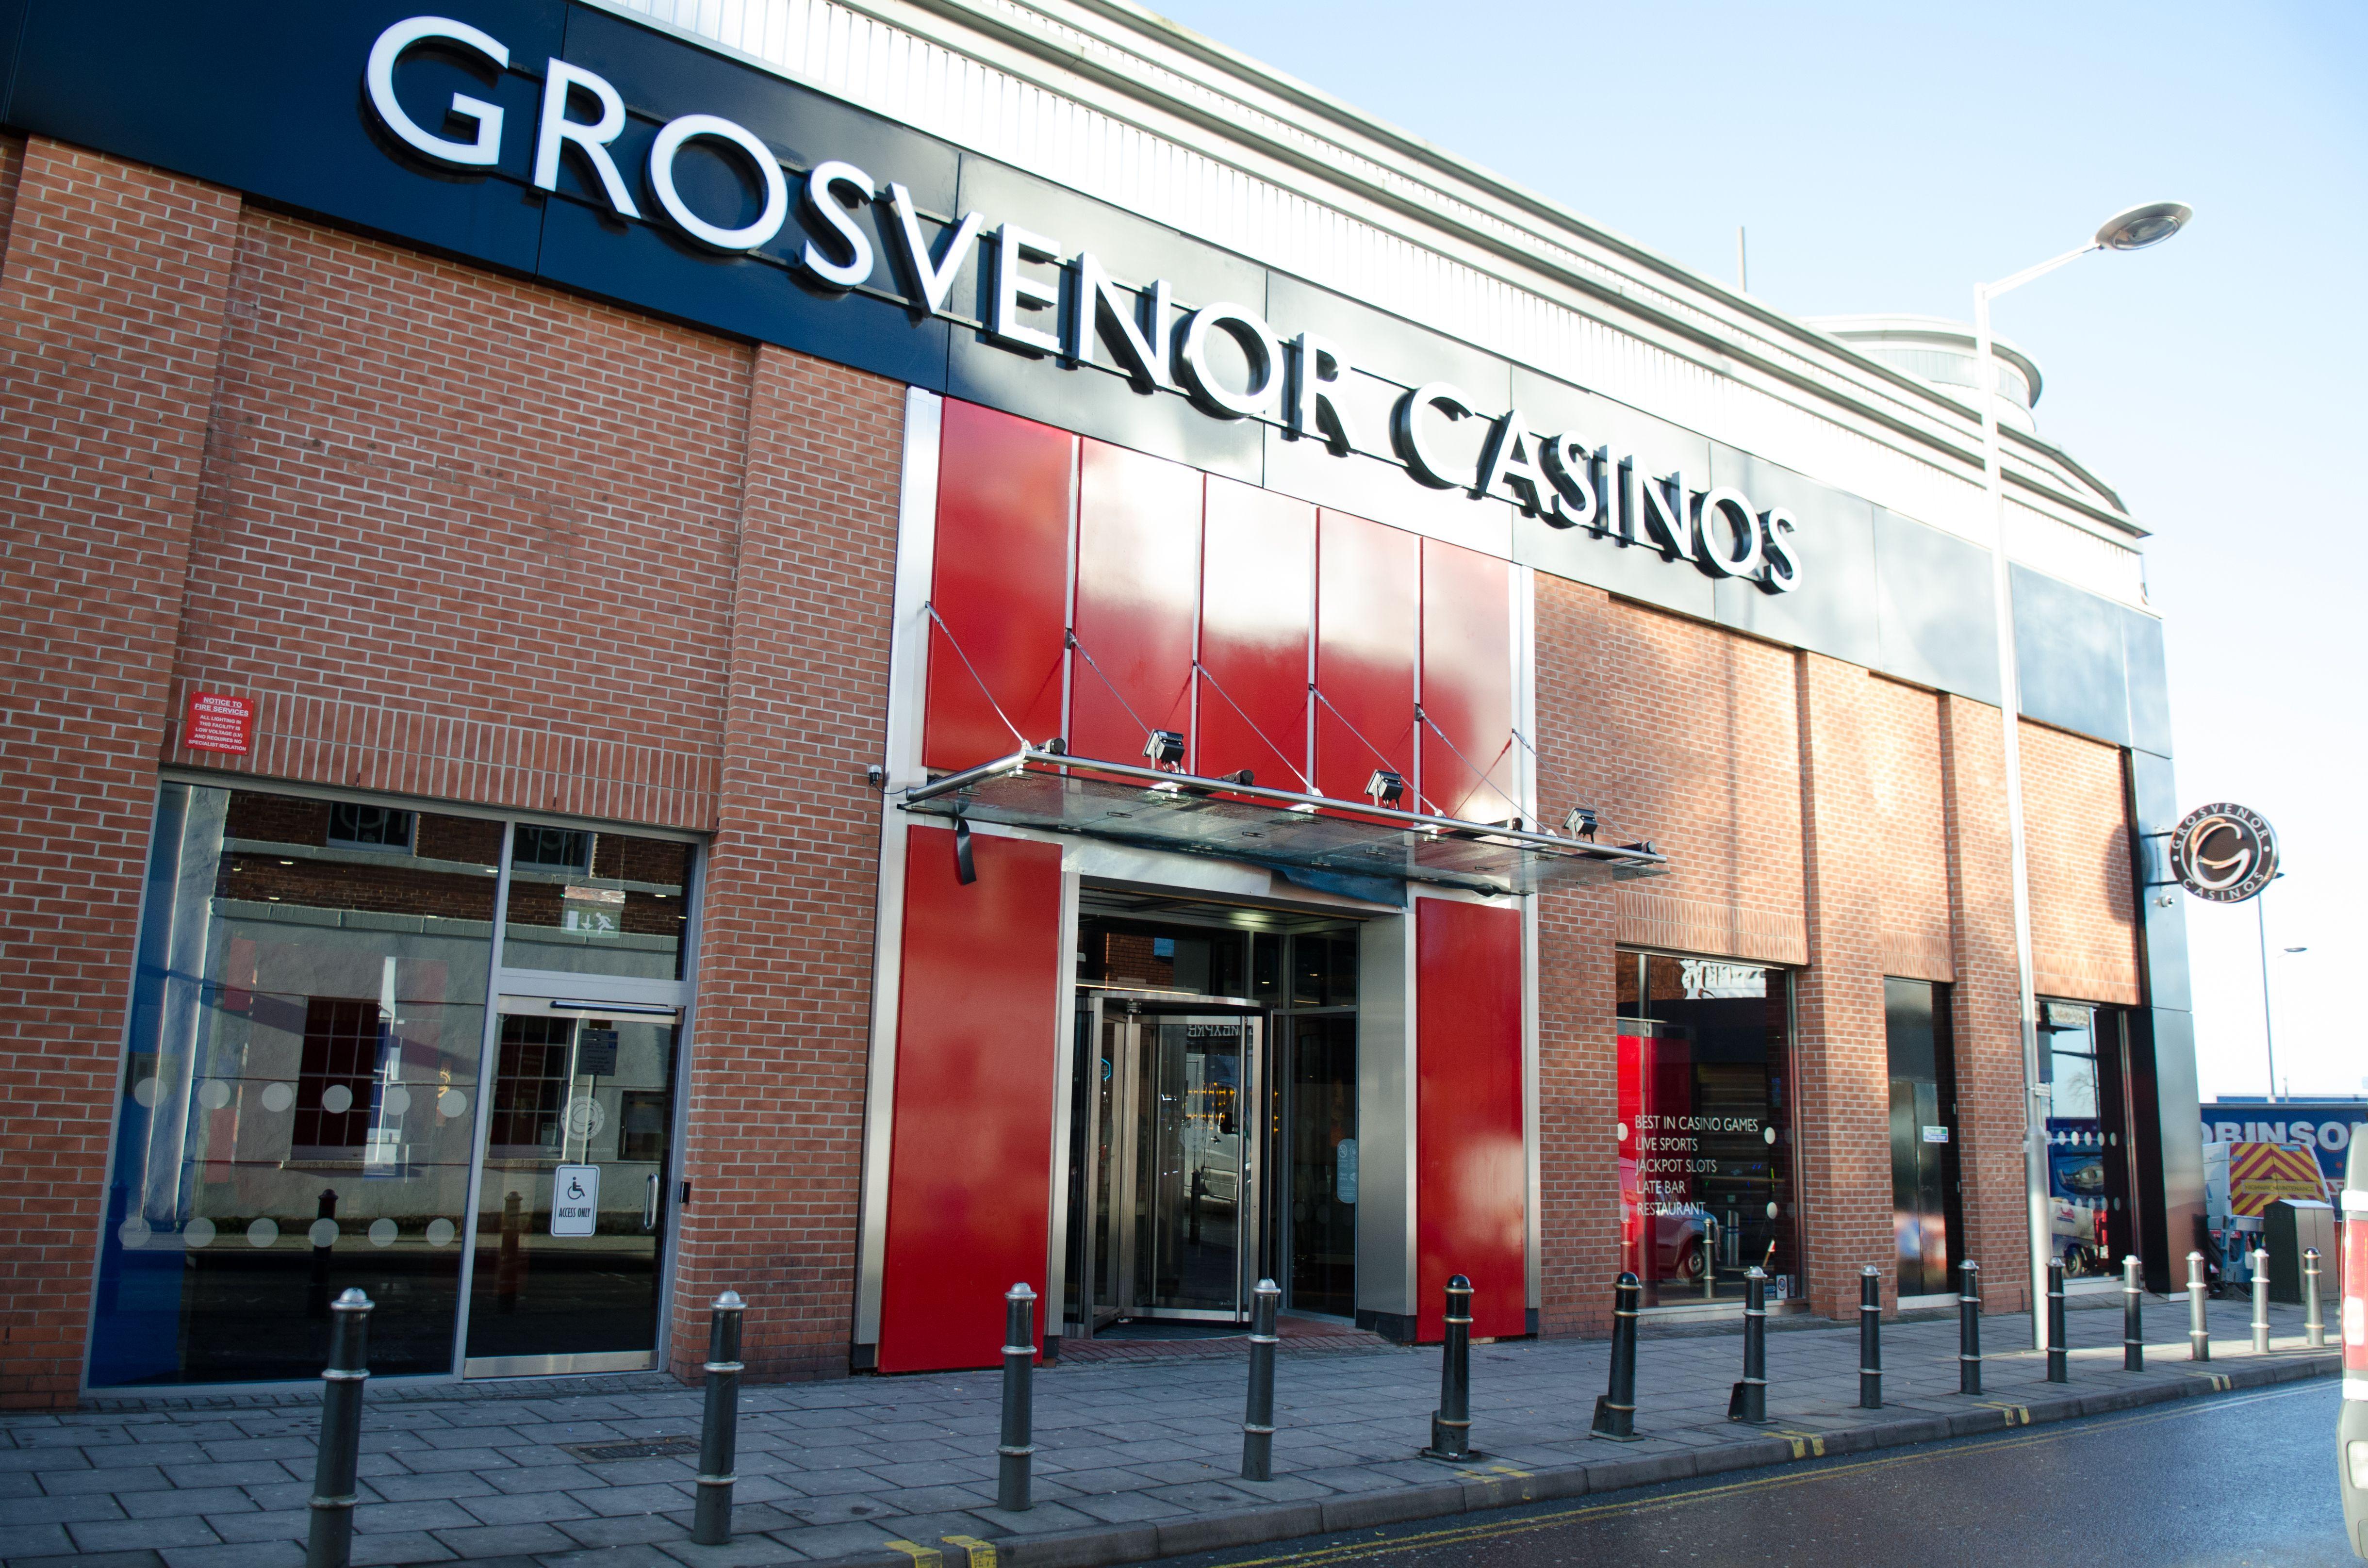 Grosvenor Casino Leicester Broadway shows